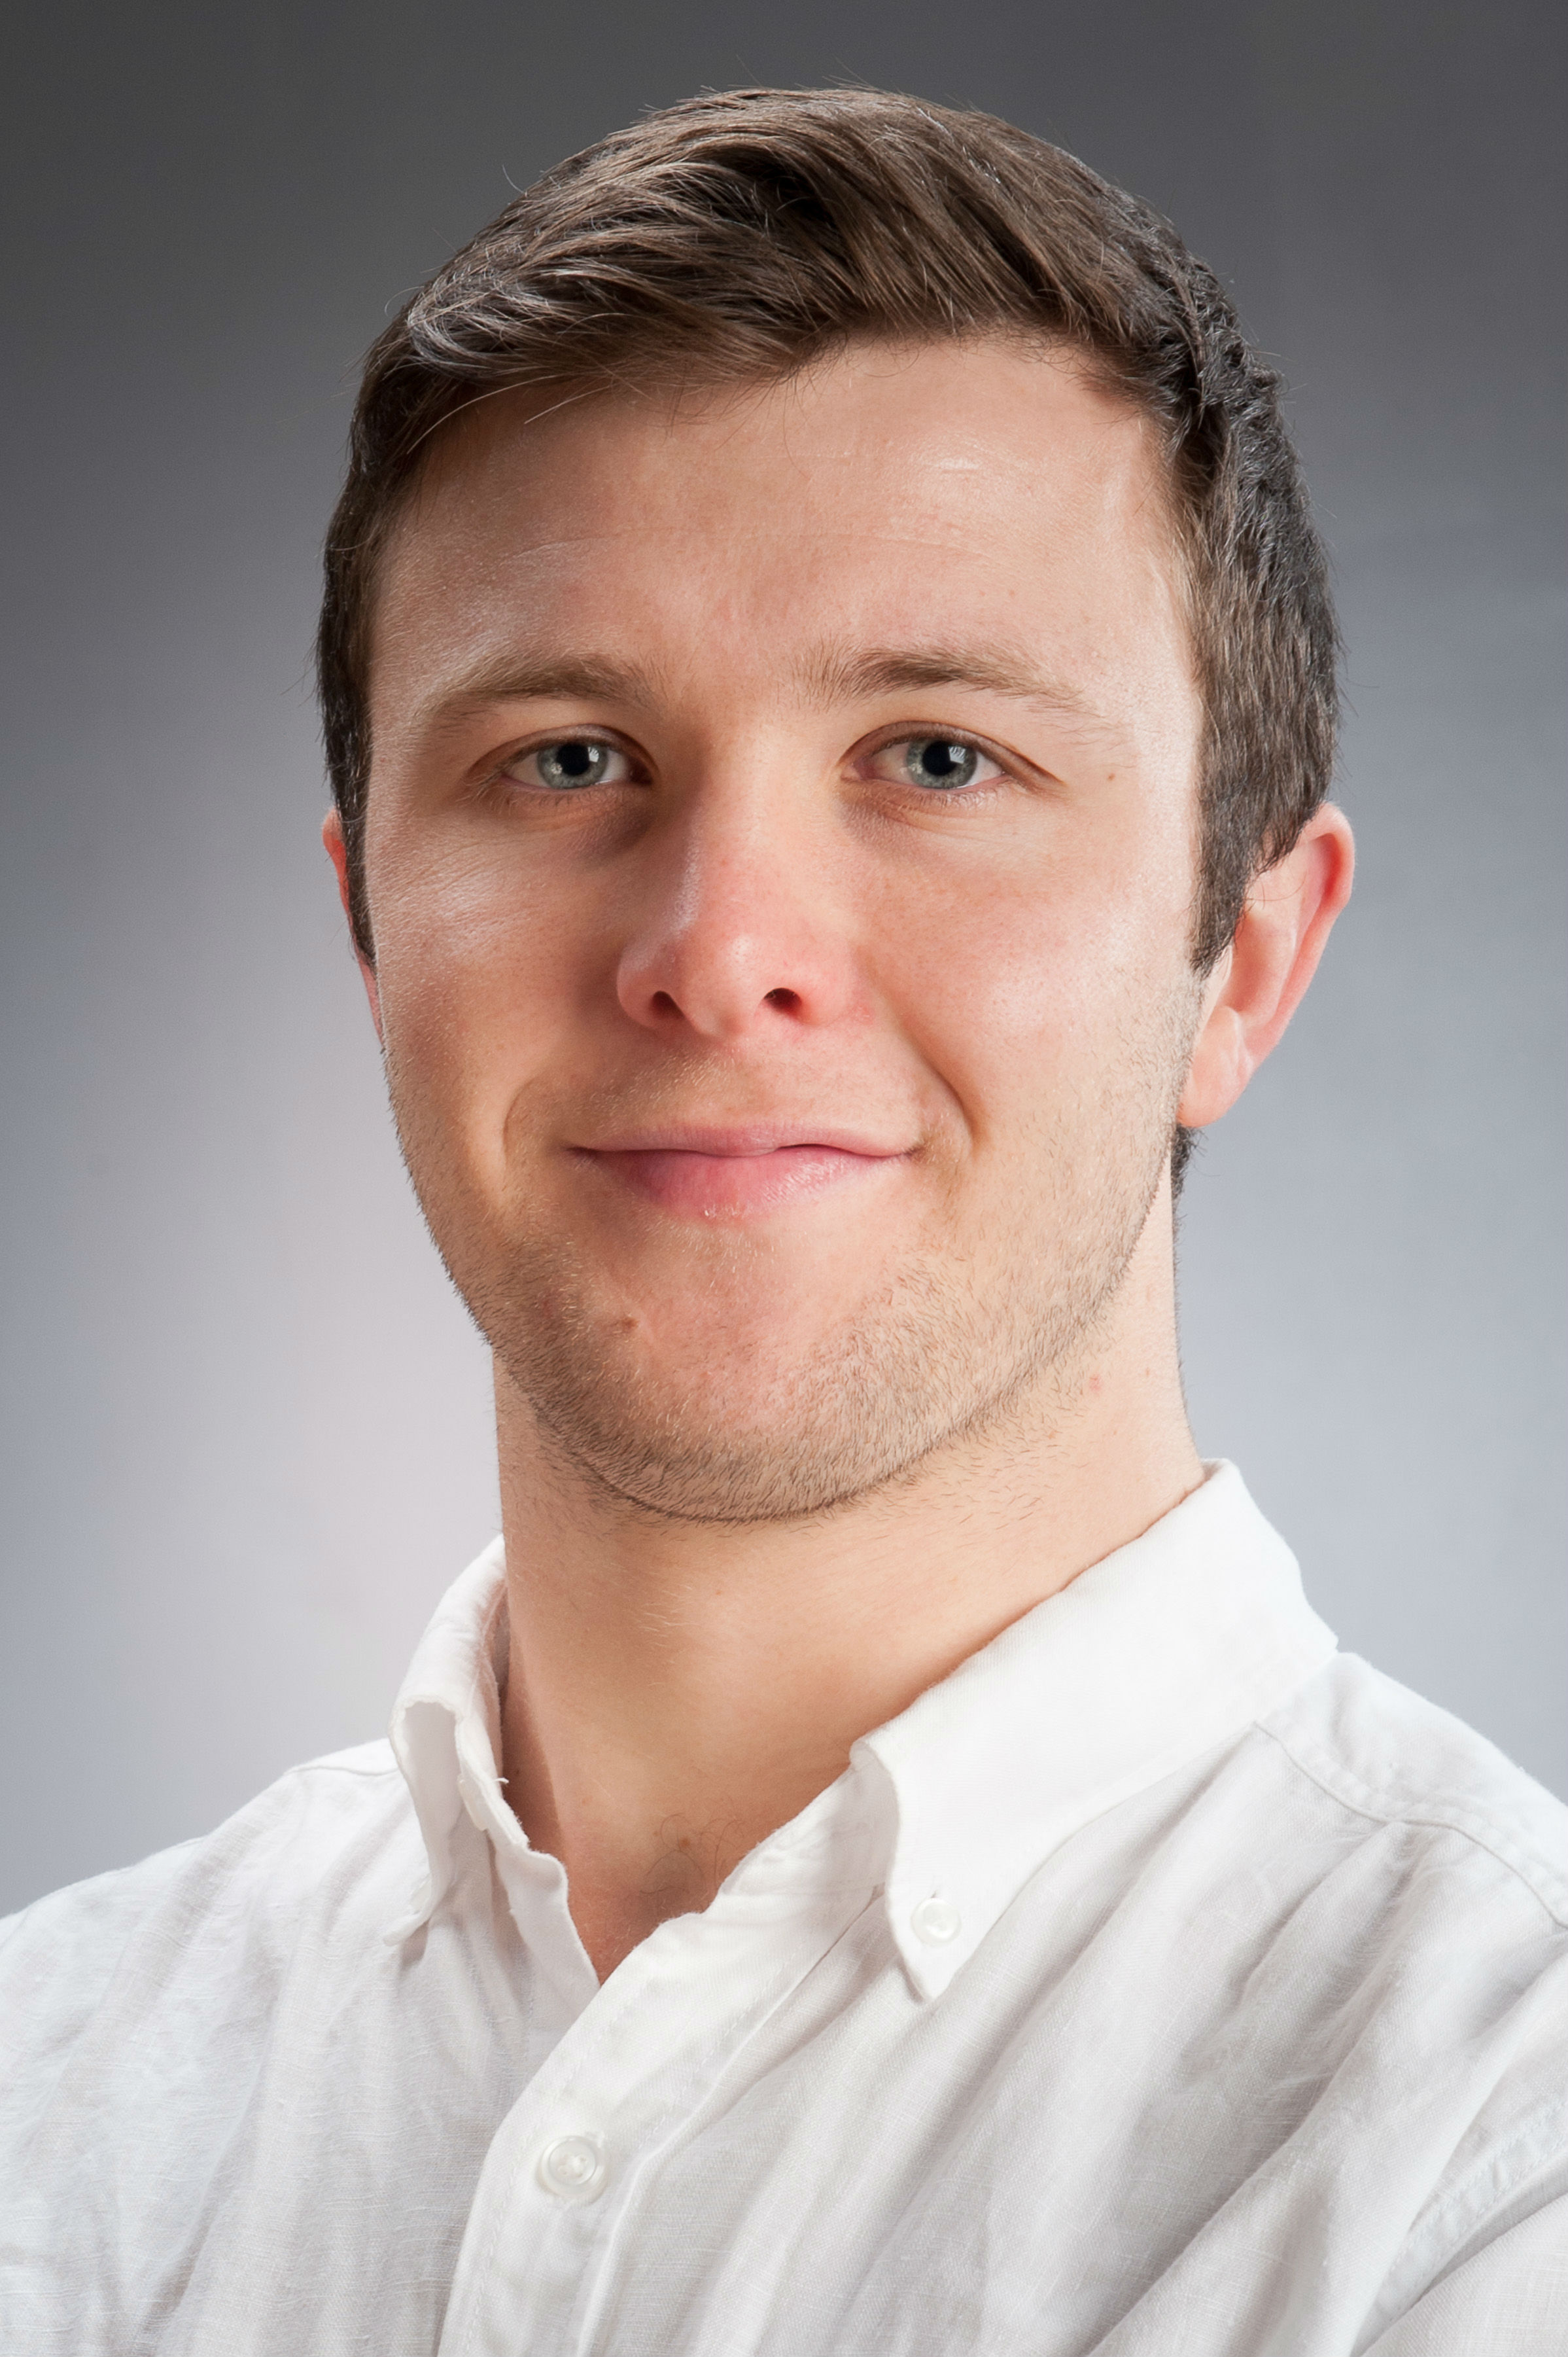 Daniel Wegerhoff profile-picture photograph